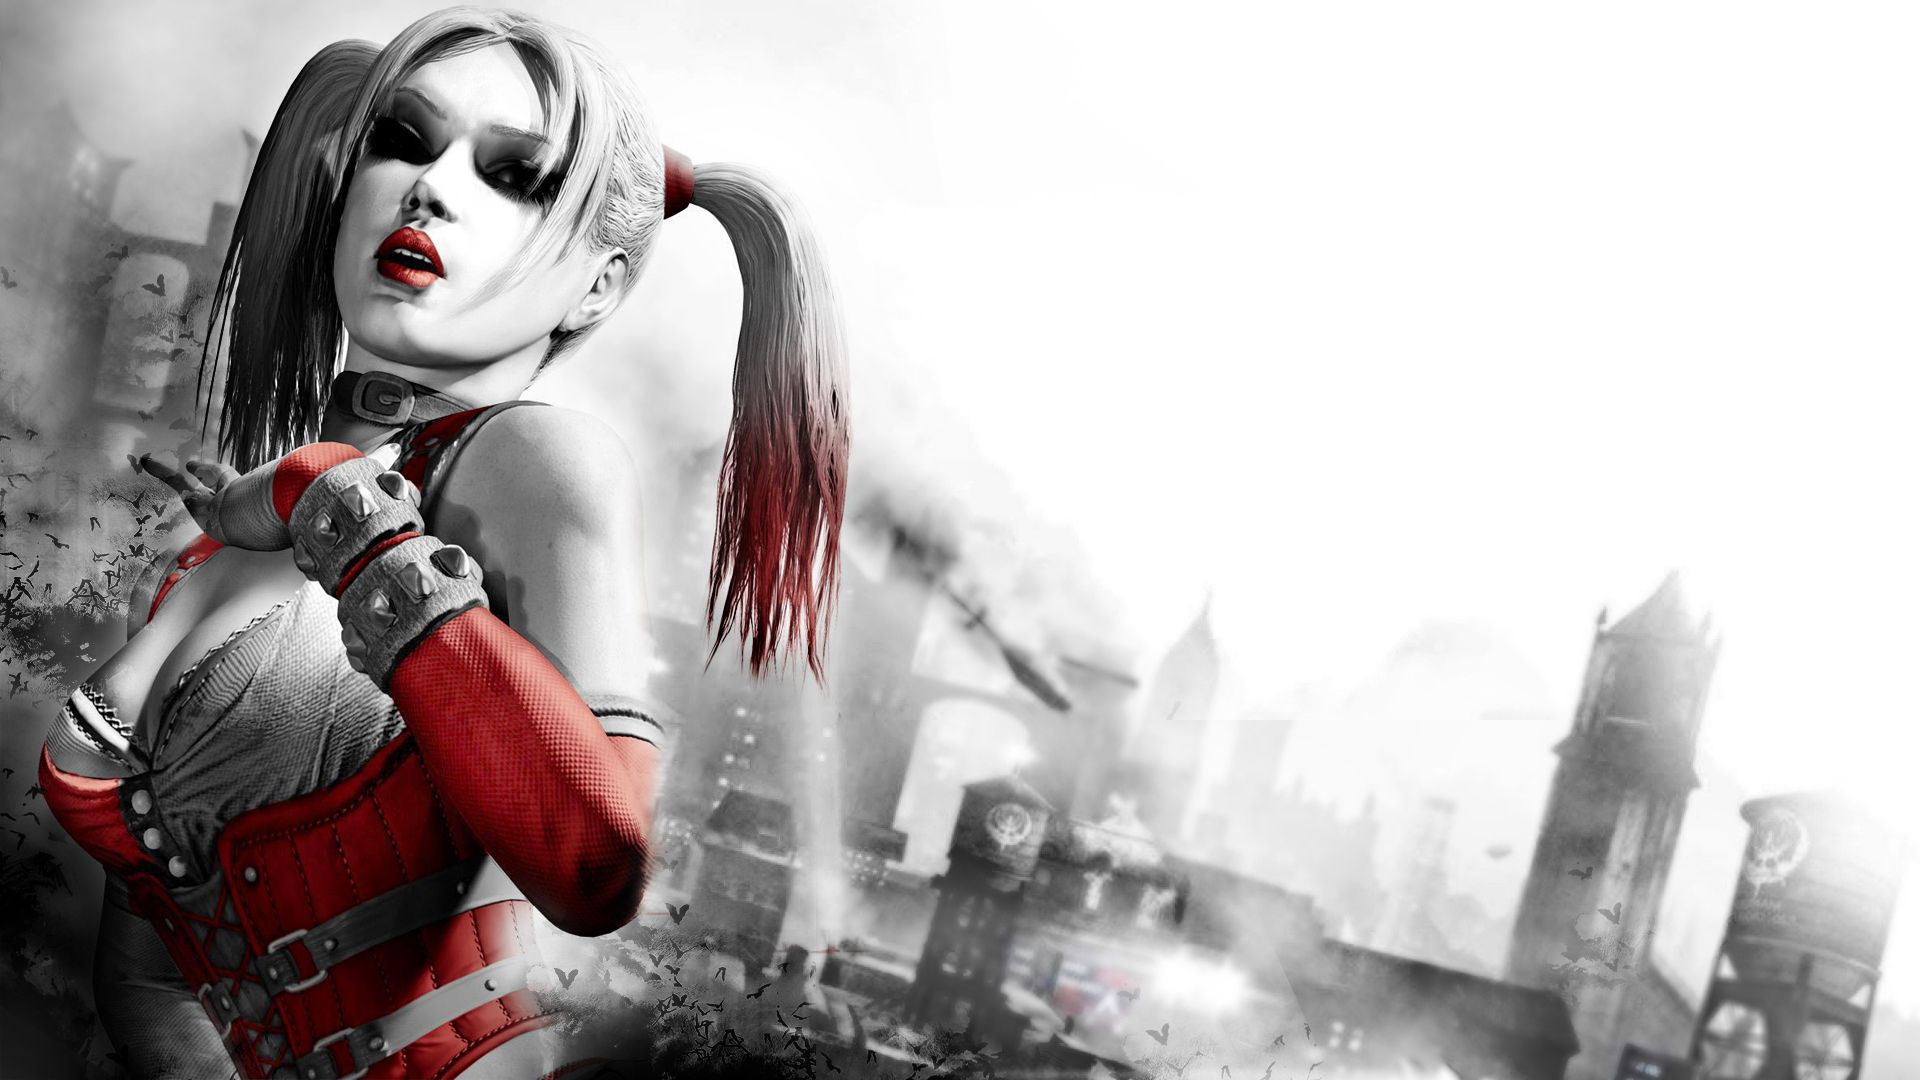 Batman Arkham City Wallpaper, Game Modeks female